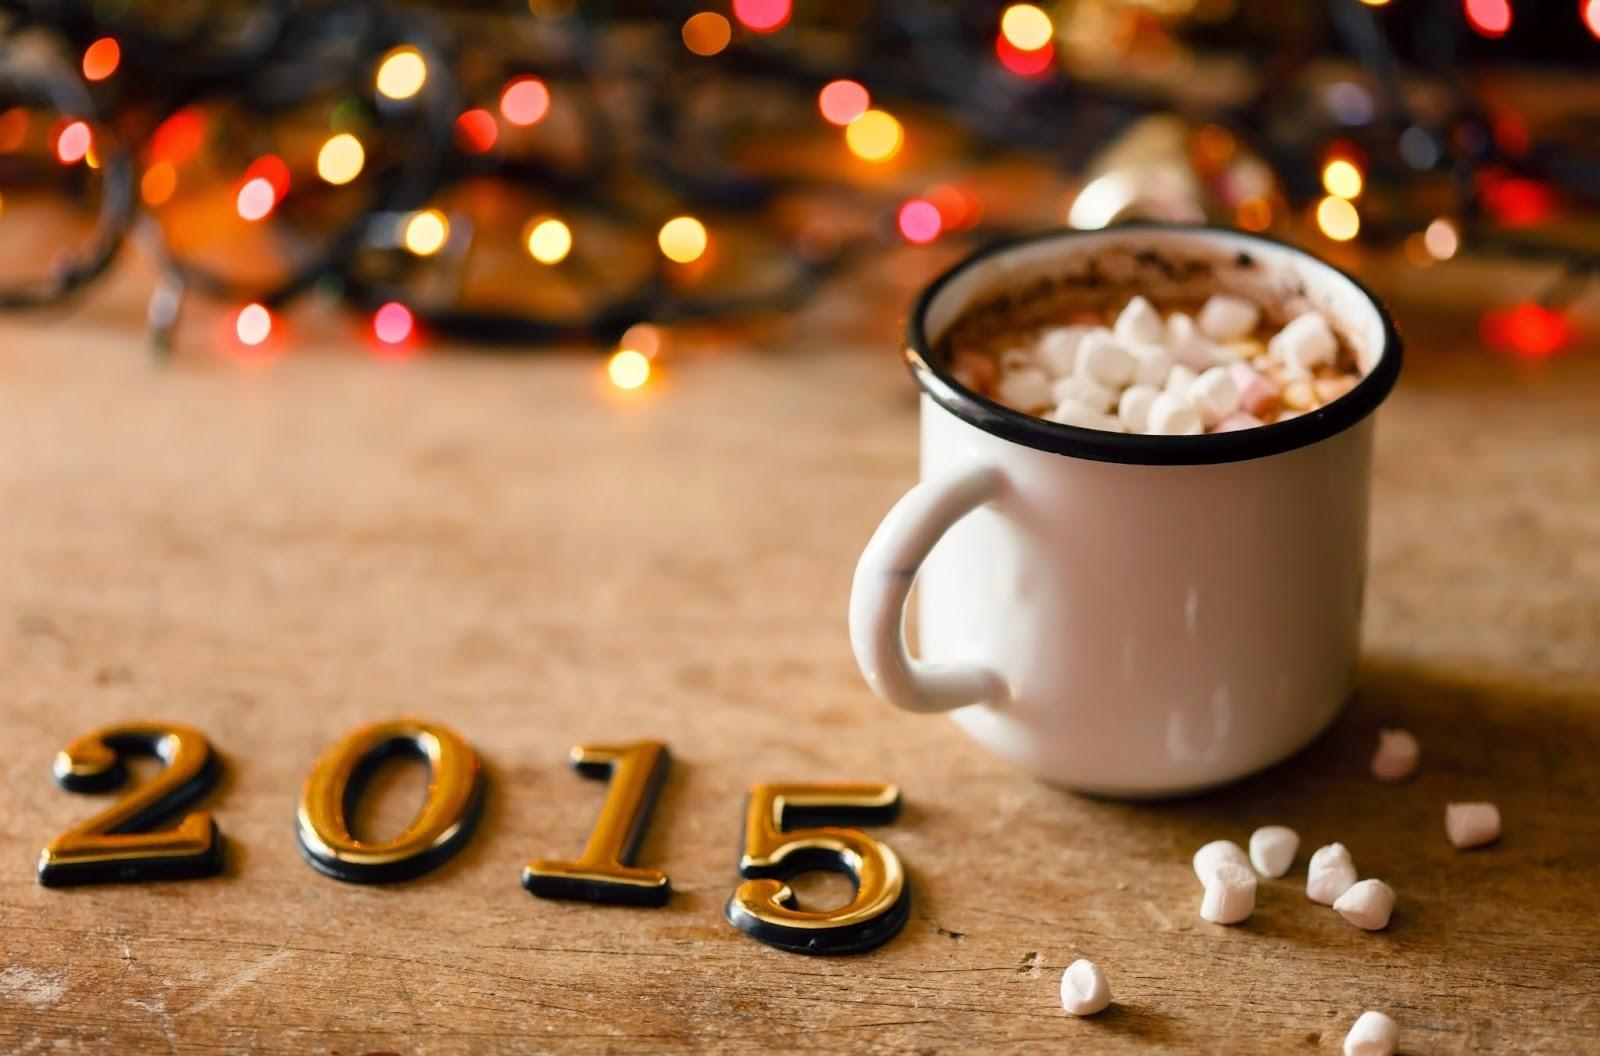 Happy New Year 2015 Coffee Mug HD Image for Whatsap